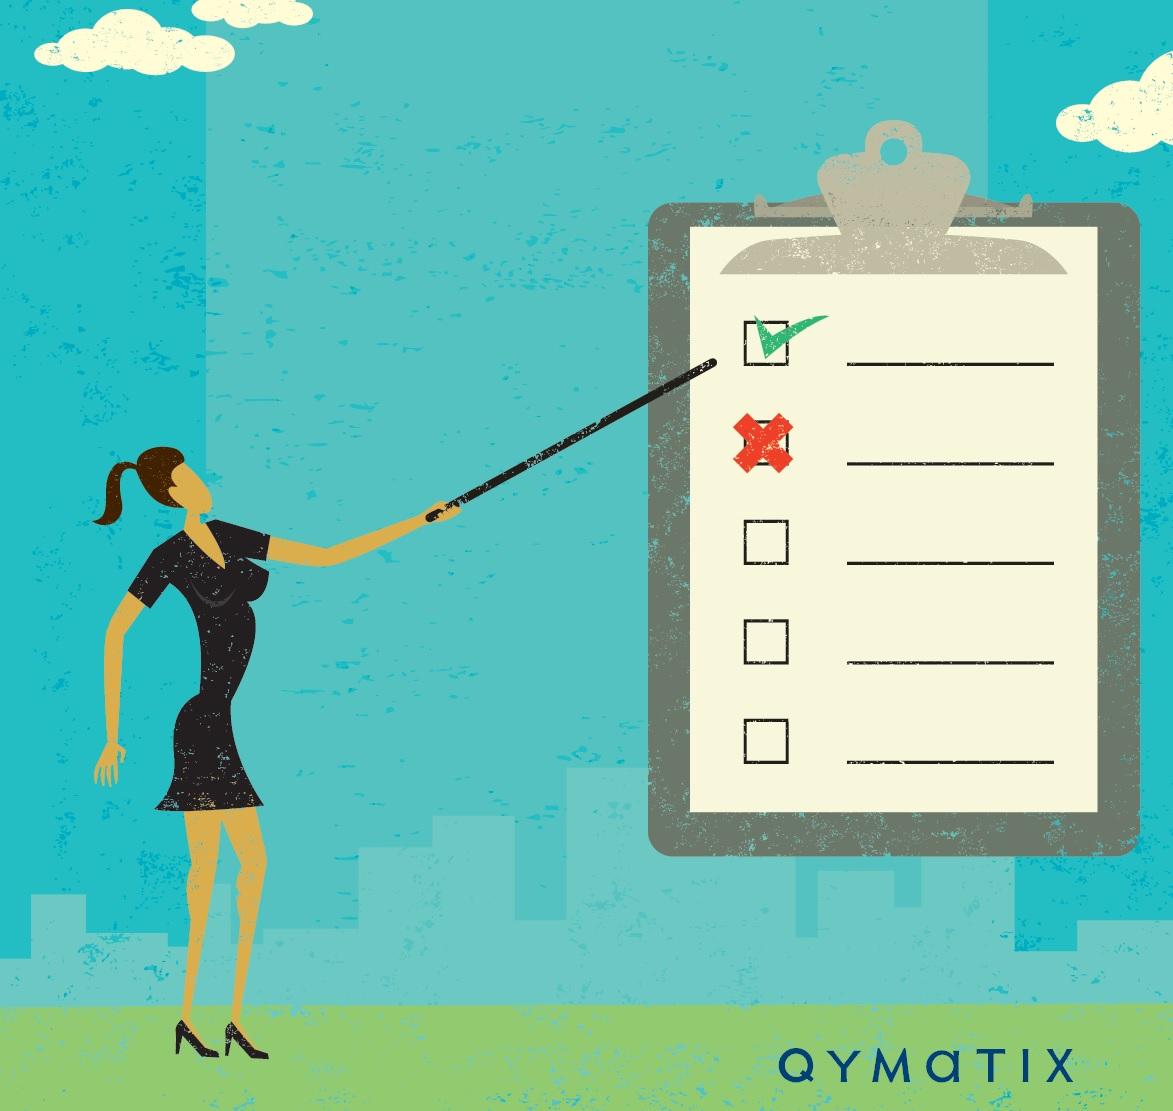 sales-growth-b2b-qymatix-accelerate